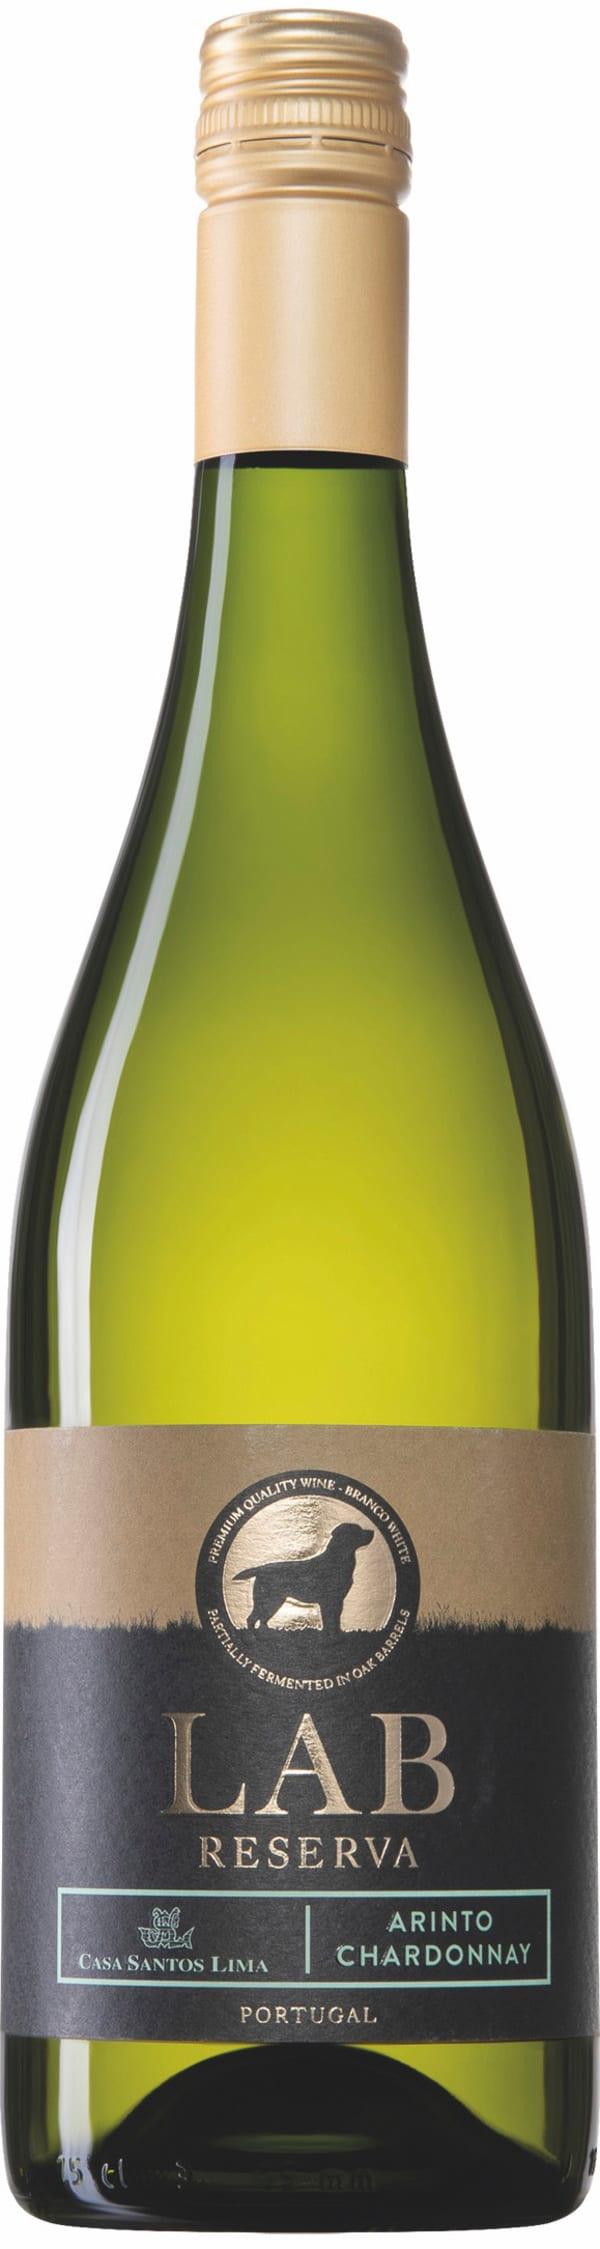 LAB Reserva Arinto Chardonnay 2017